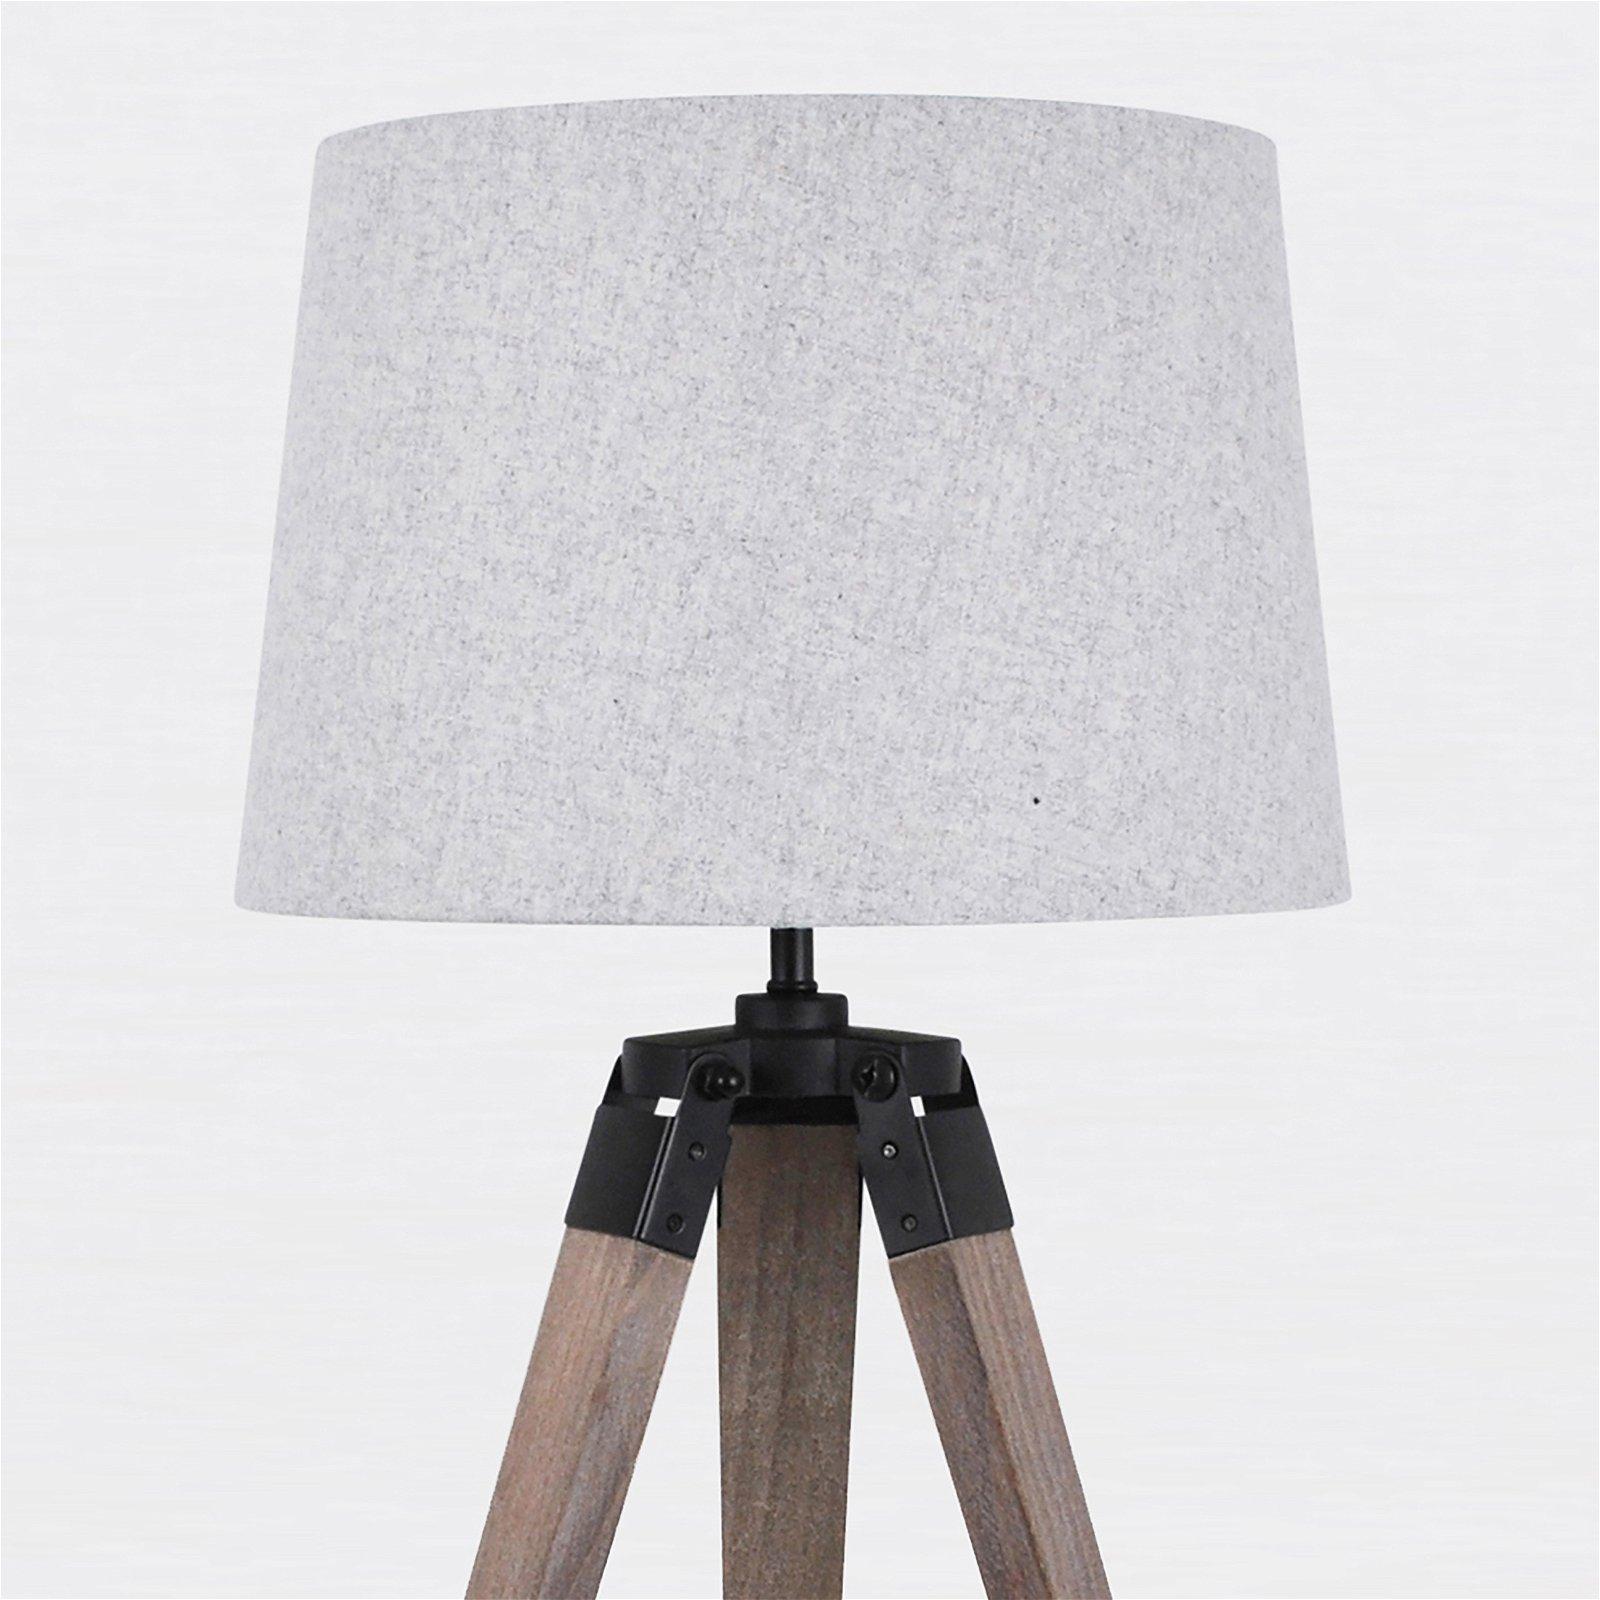 thumbnail 4 - Grey Wash Tripod Wood Table or Floor Lamp Black Painted Metal and Grey Shade